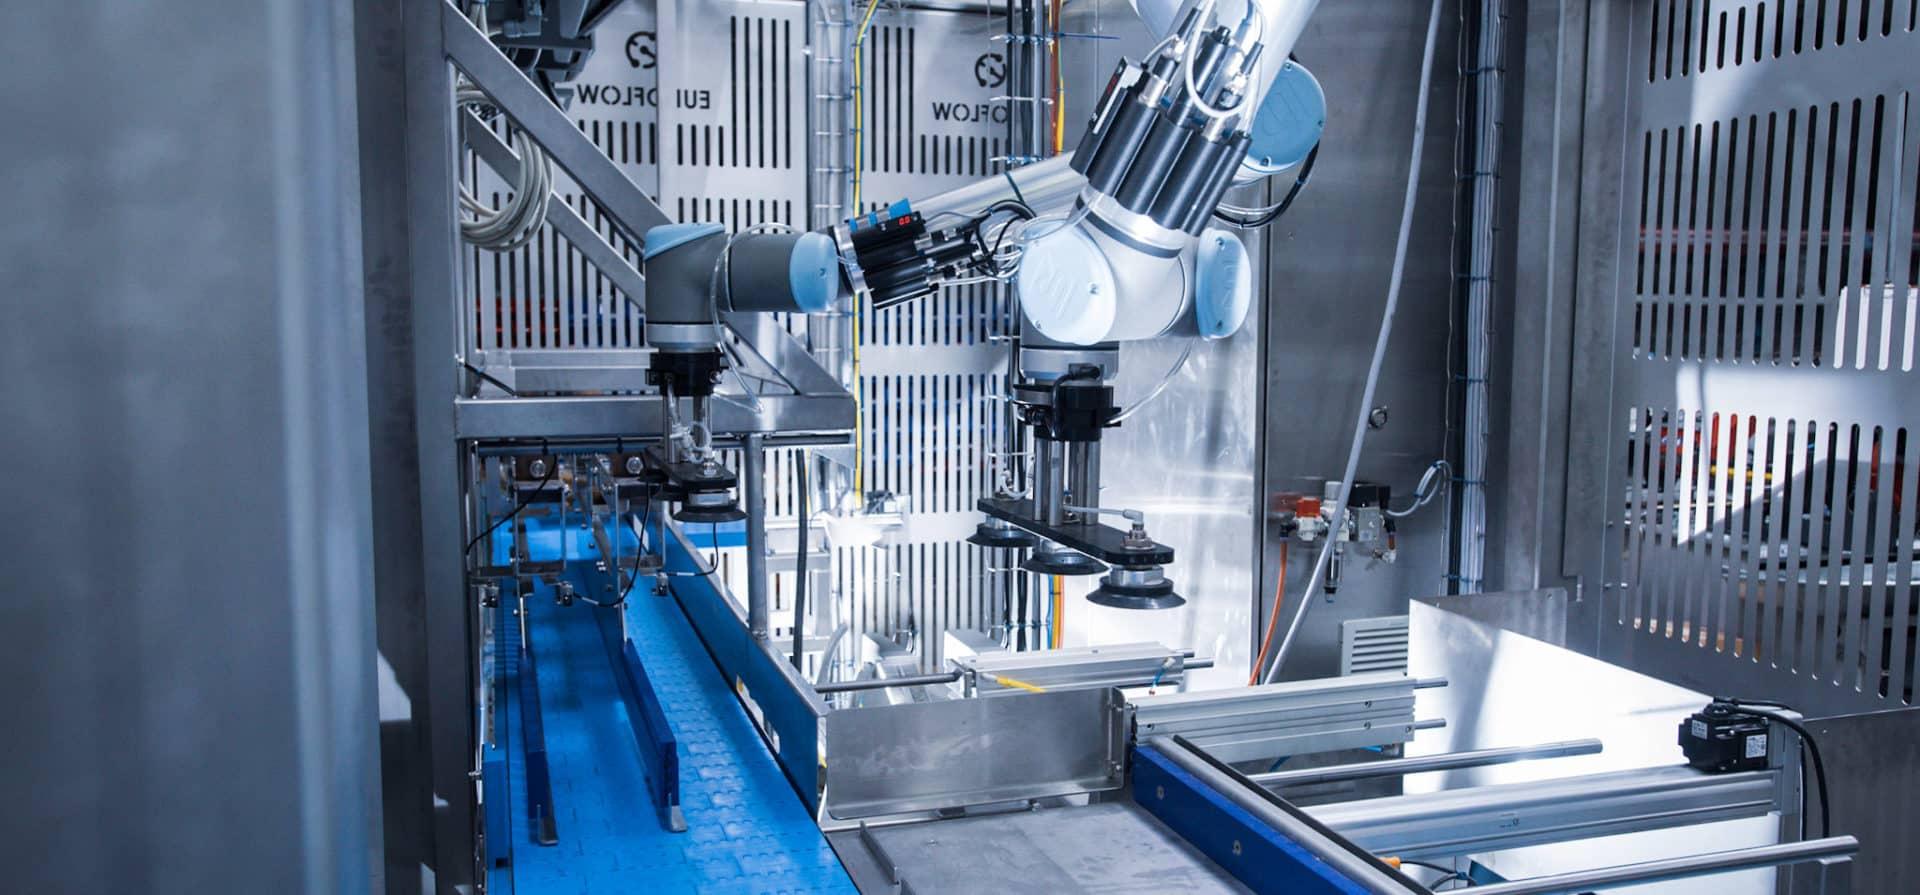 Robotics & Automation - Collaborative Robotics | Euroflow Automation Ltd